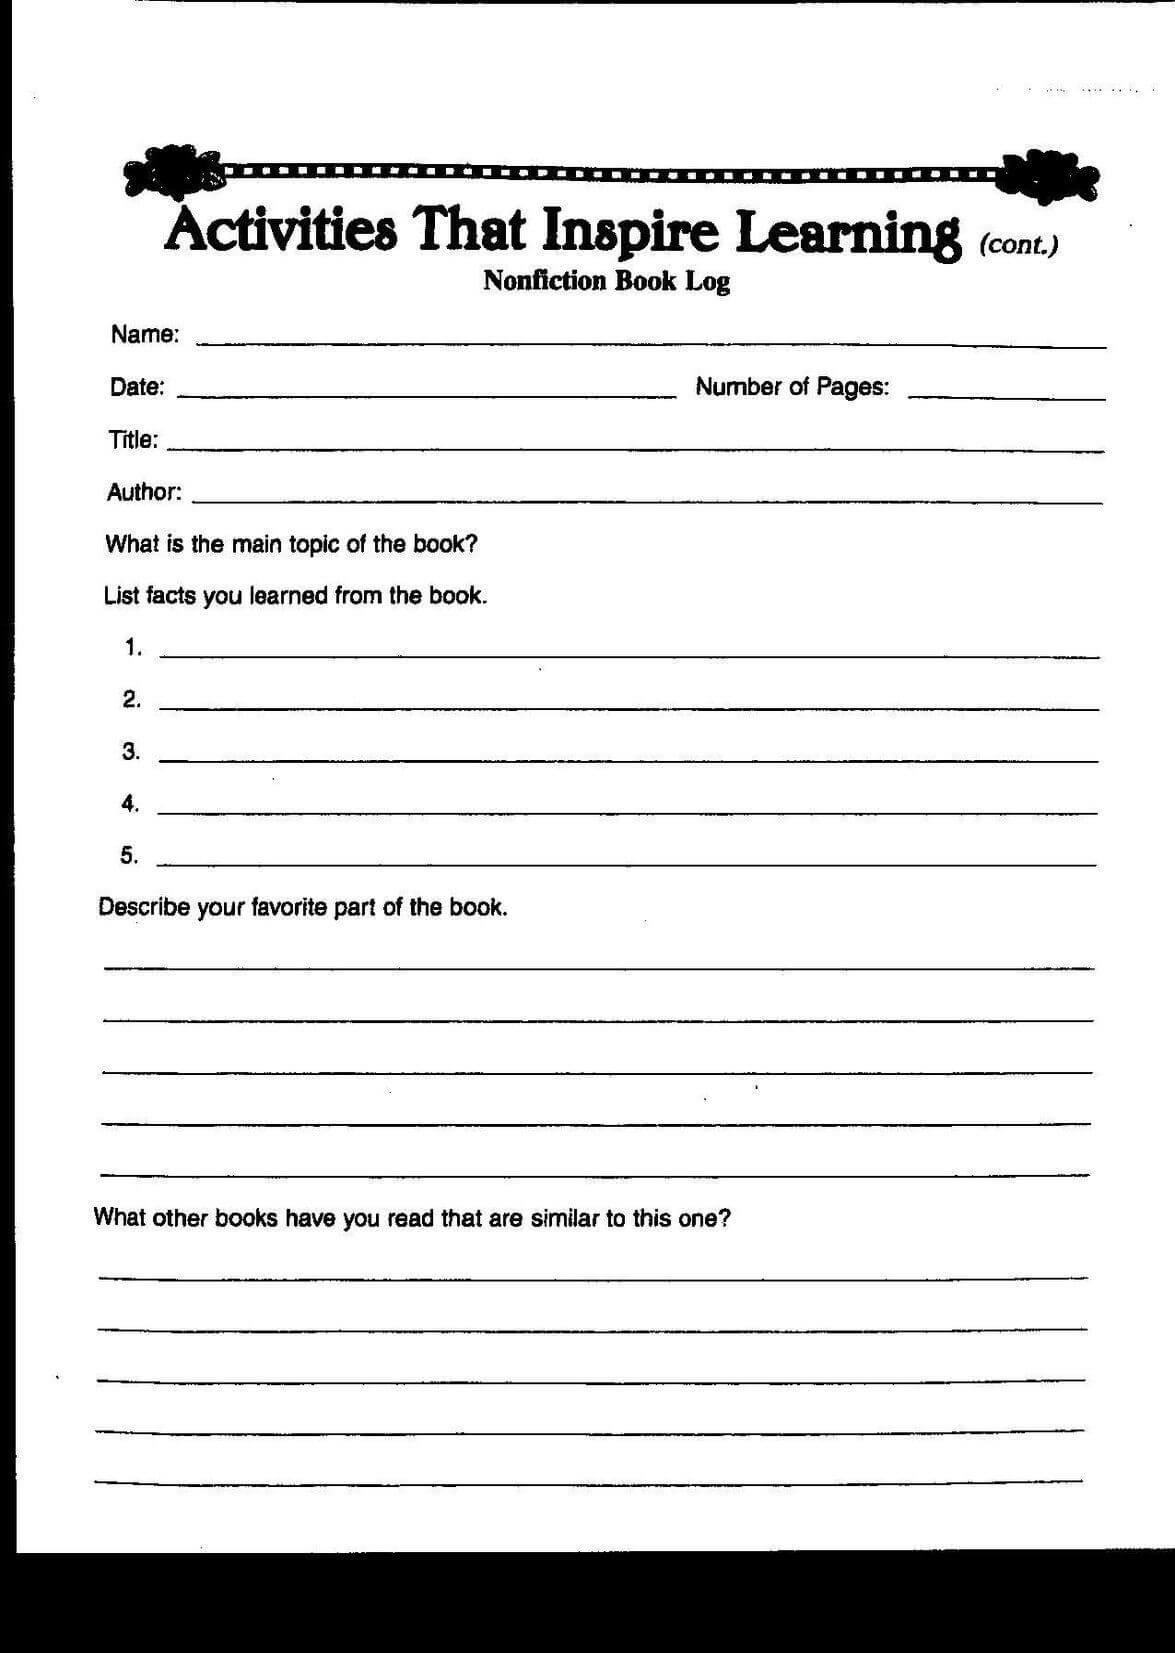 Grade Report Template Aplg Planetariumsorg New 4Th Grade Regarding Book Report Template 4Th Grade